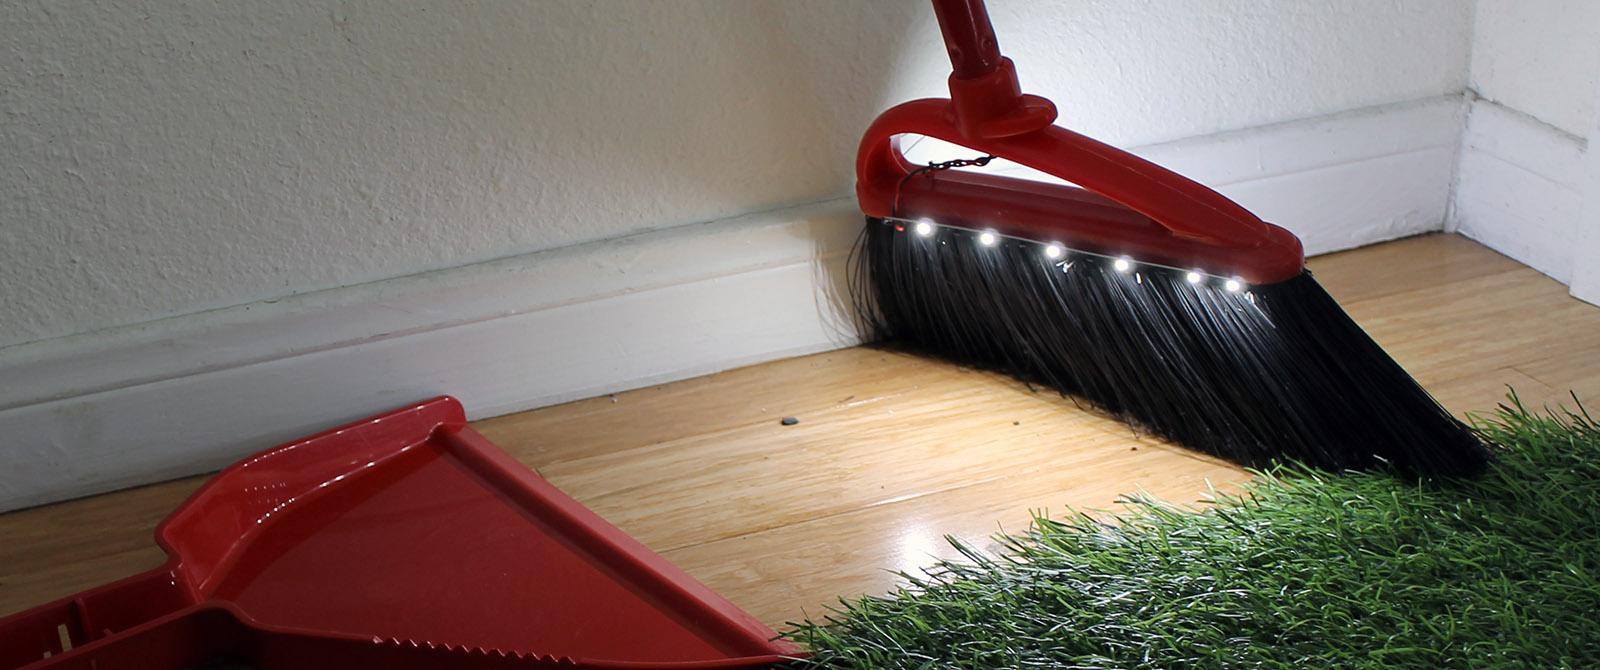 build an led broom to light up life s dark corners make